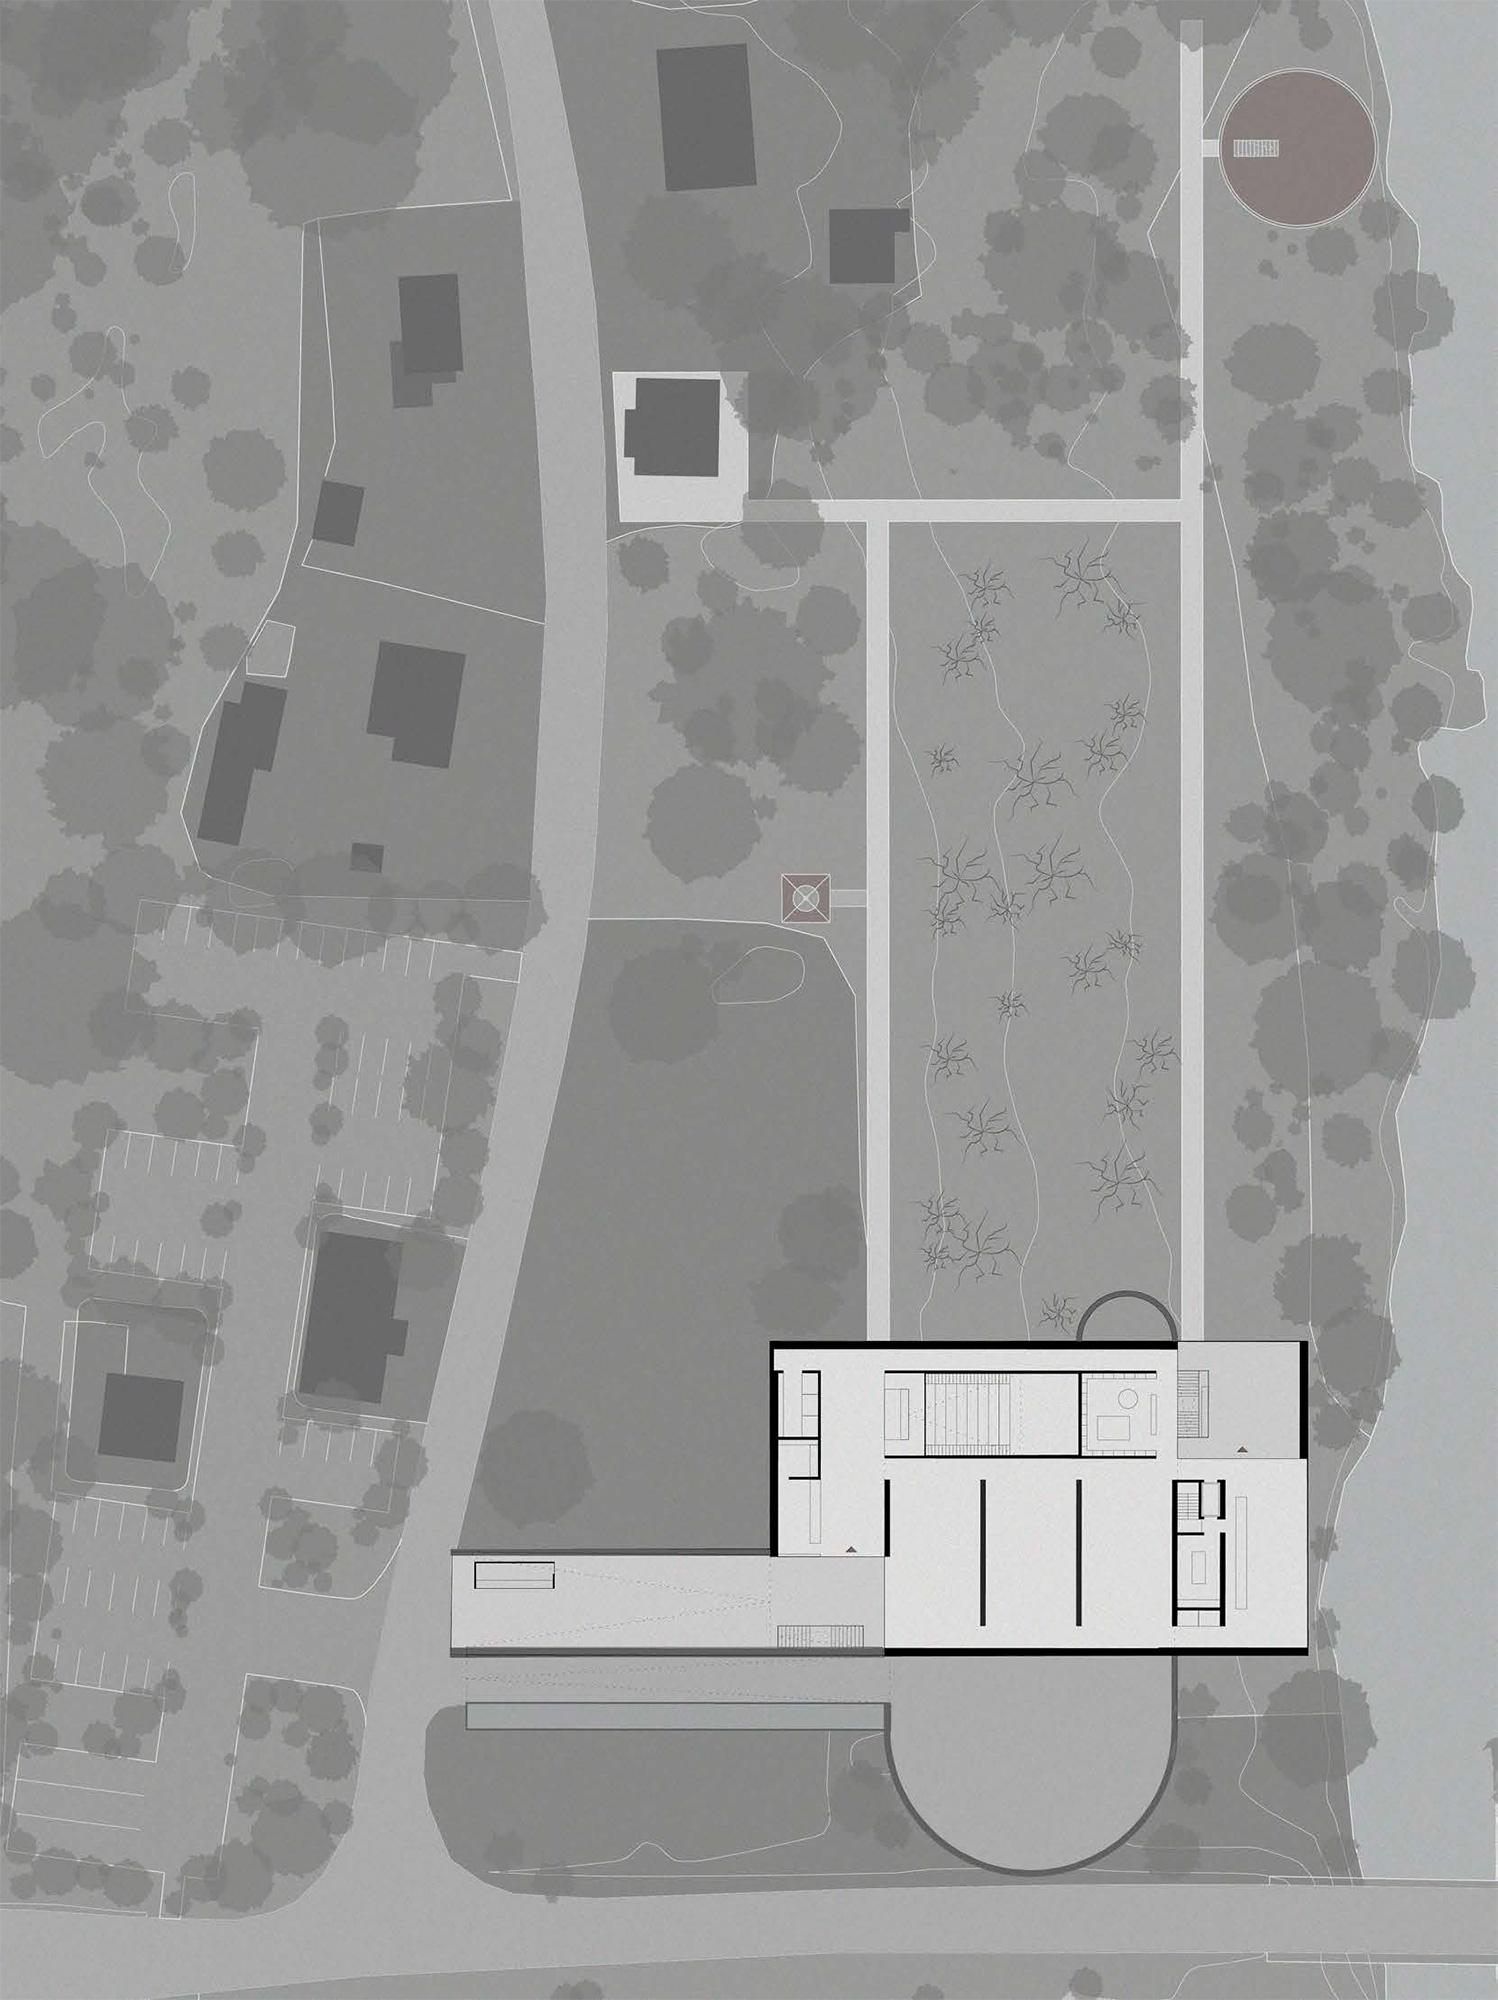 X01-entry-.-Skogfinsk-Museum-.-Svullrya-10.jpg